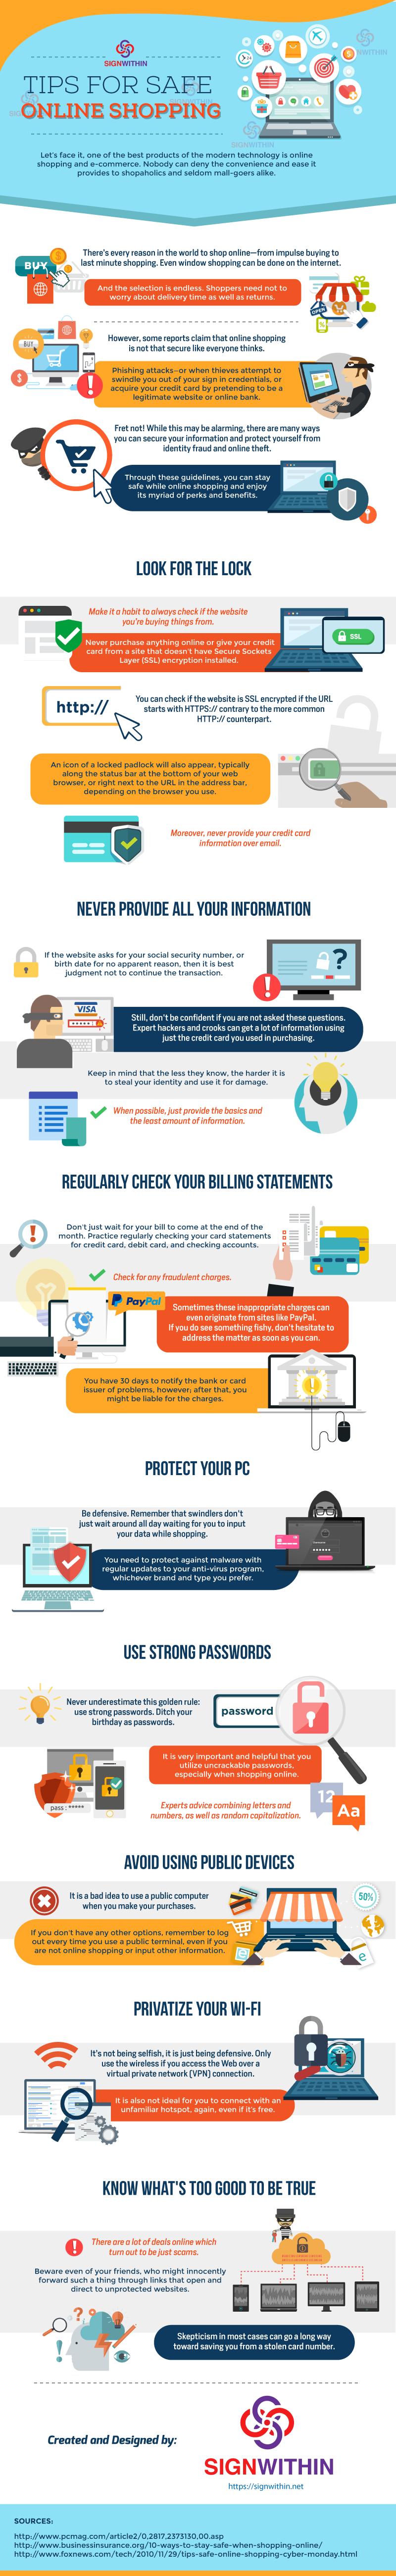 Tips for Safe Online Shopping-01